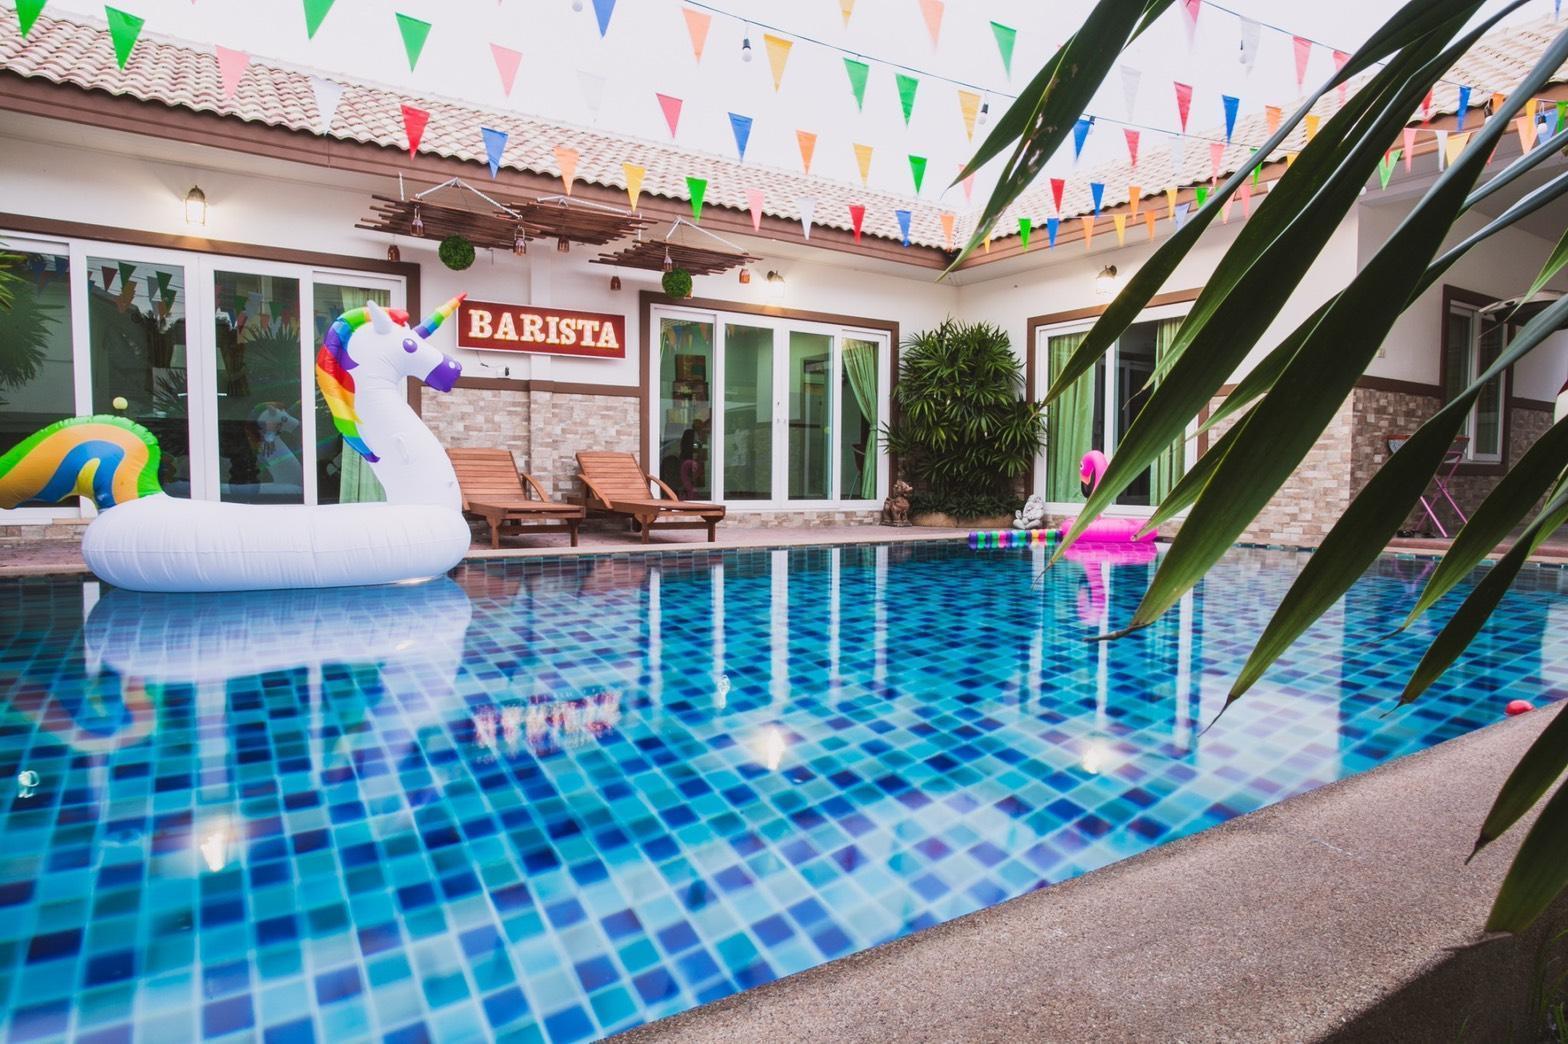 Baan Pool Villa05 (Pattaya-Nong Hin) วิลลา 3 ห้องนอน 3 ห้องน้ำส่วนตัว ขนาด 400 ตร.ม. – เขาตาโล